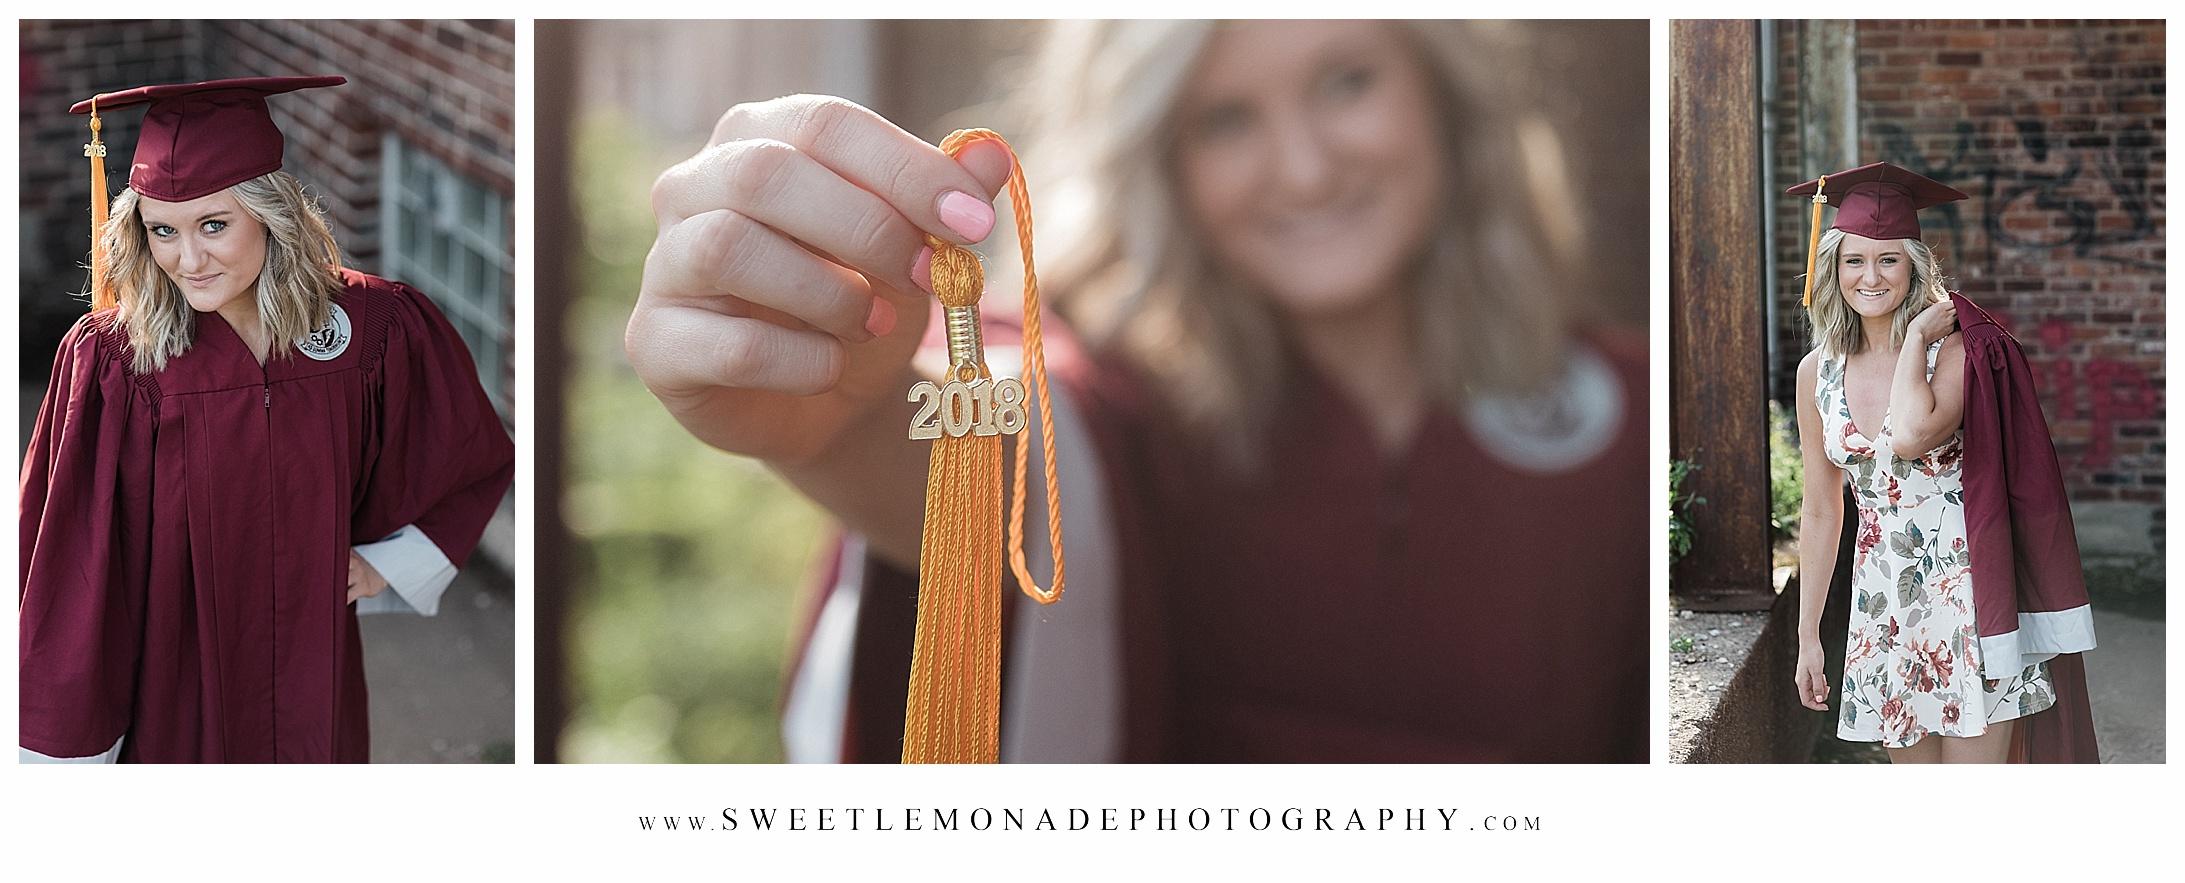 champaign-illinois-unity-rockets-high-school-graduation-tolono-senior-photographer-sweet-lemonade-photography_2071.jpg